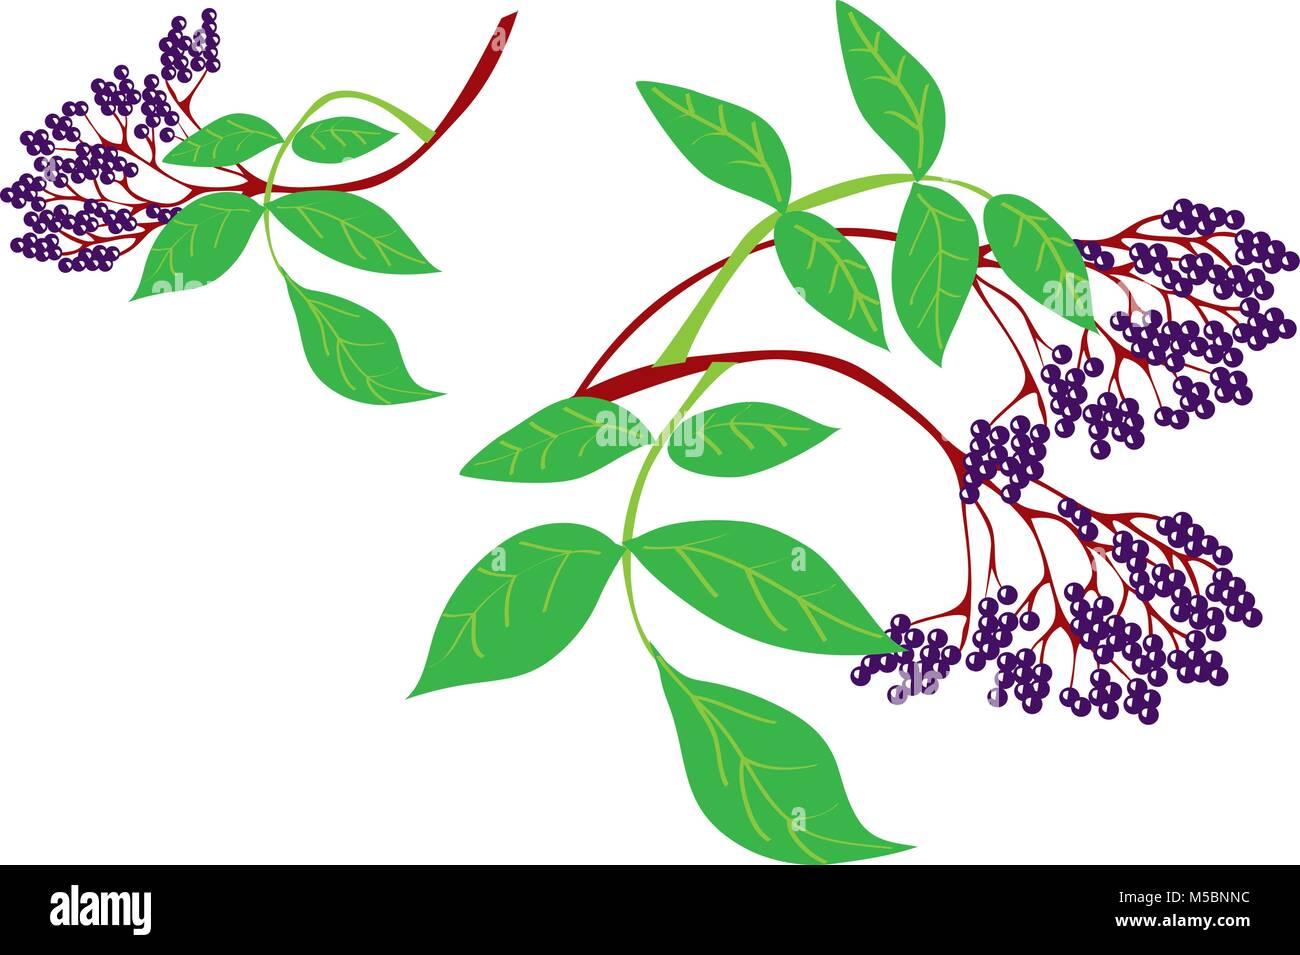 A cartoon illustration of Elderberries - Stock Vector